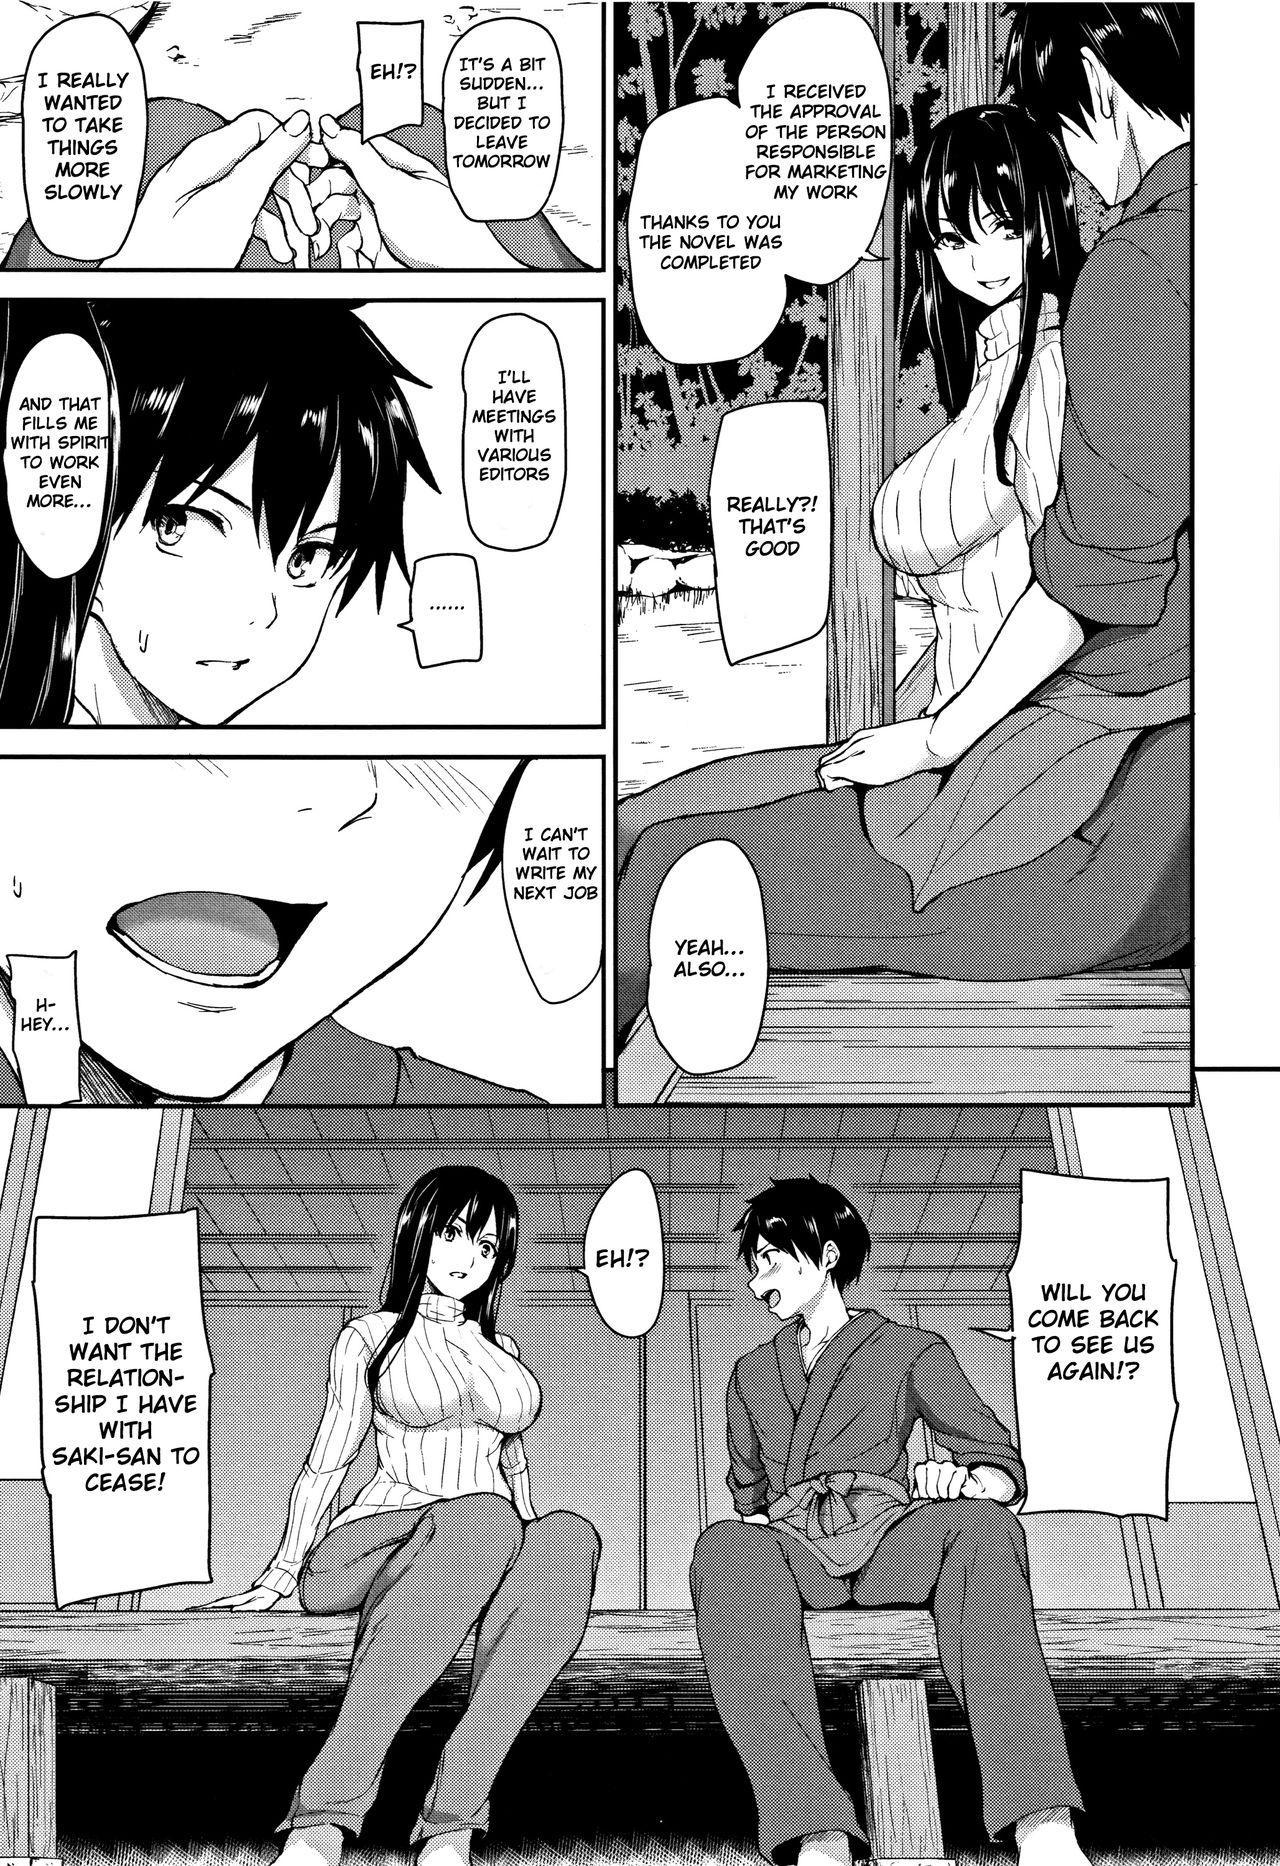 Yukemuri Harem Monogatari Saishuuwa   Yukemuri Harem Monogatari Final Chapter 2